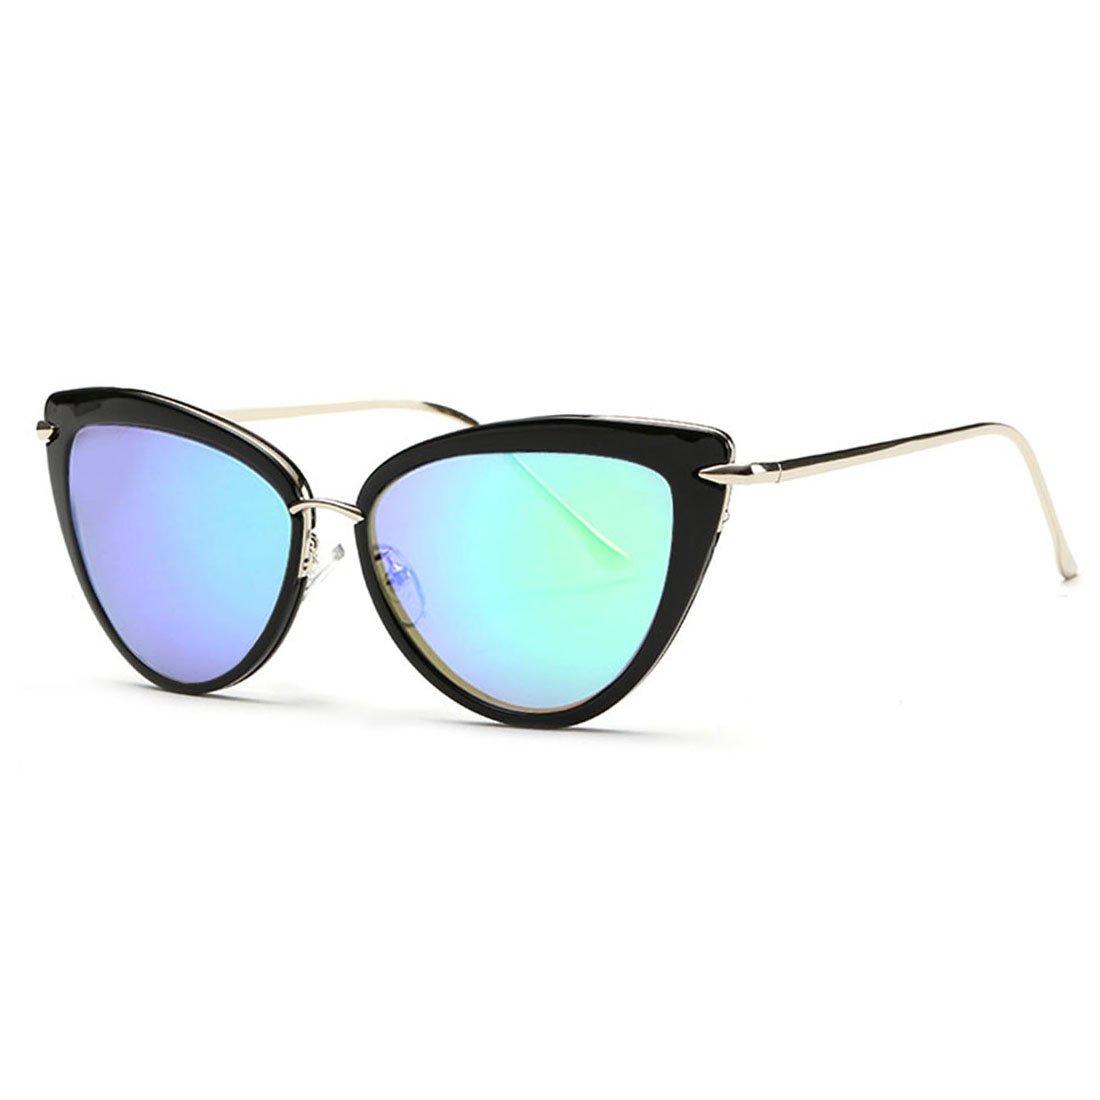 AEVOGUE Sunglasses For Women Cat Eye Frame Metal Temple Brand Designer AE0269 (Silver&Green, 57)